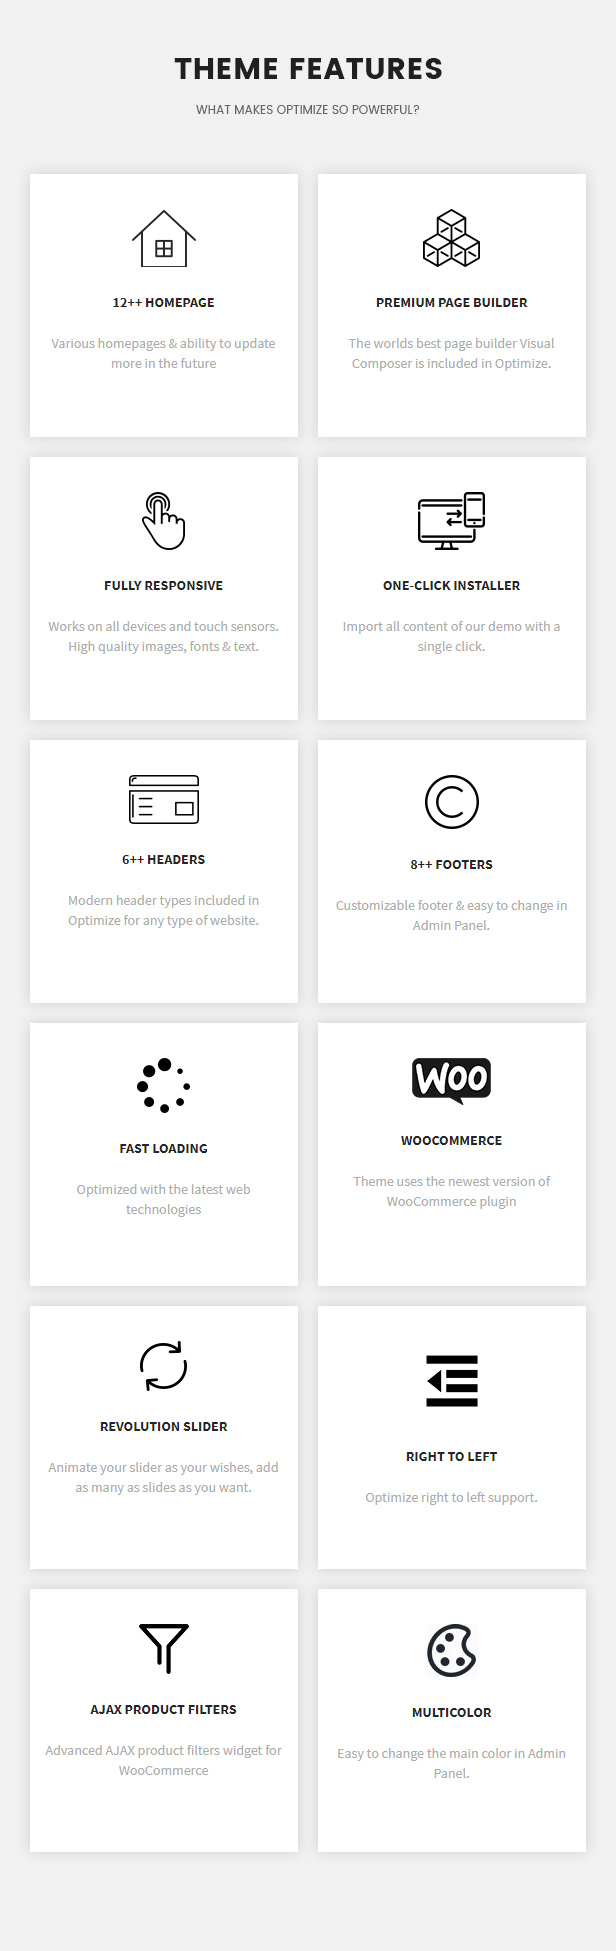 Oritina - Minimal WooCommerce Theme For Furniture, Decor, Interior | Prosyscom Tech 4